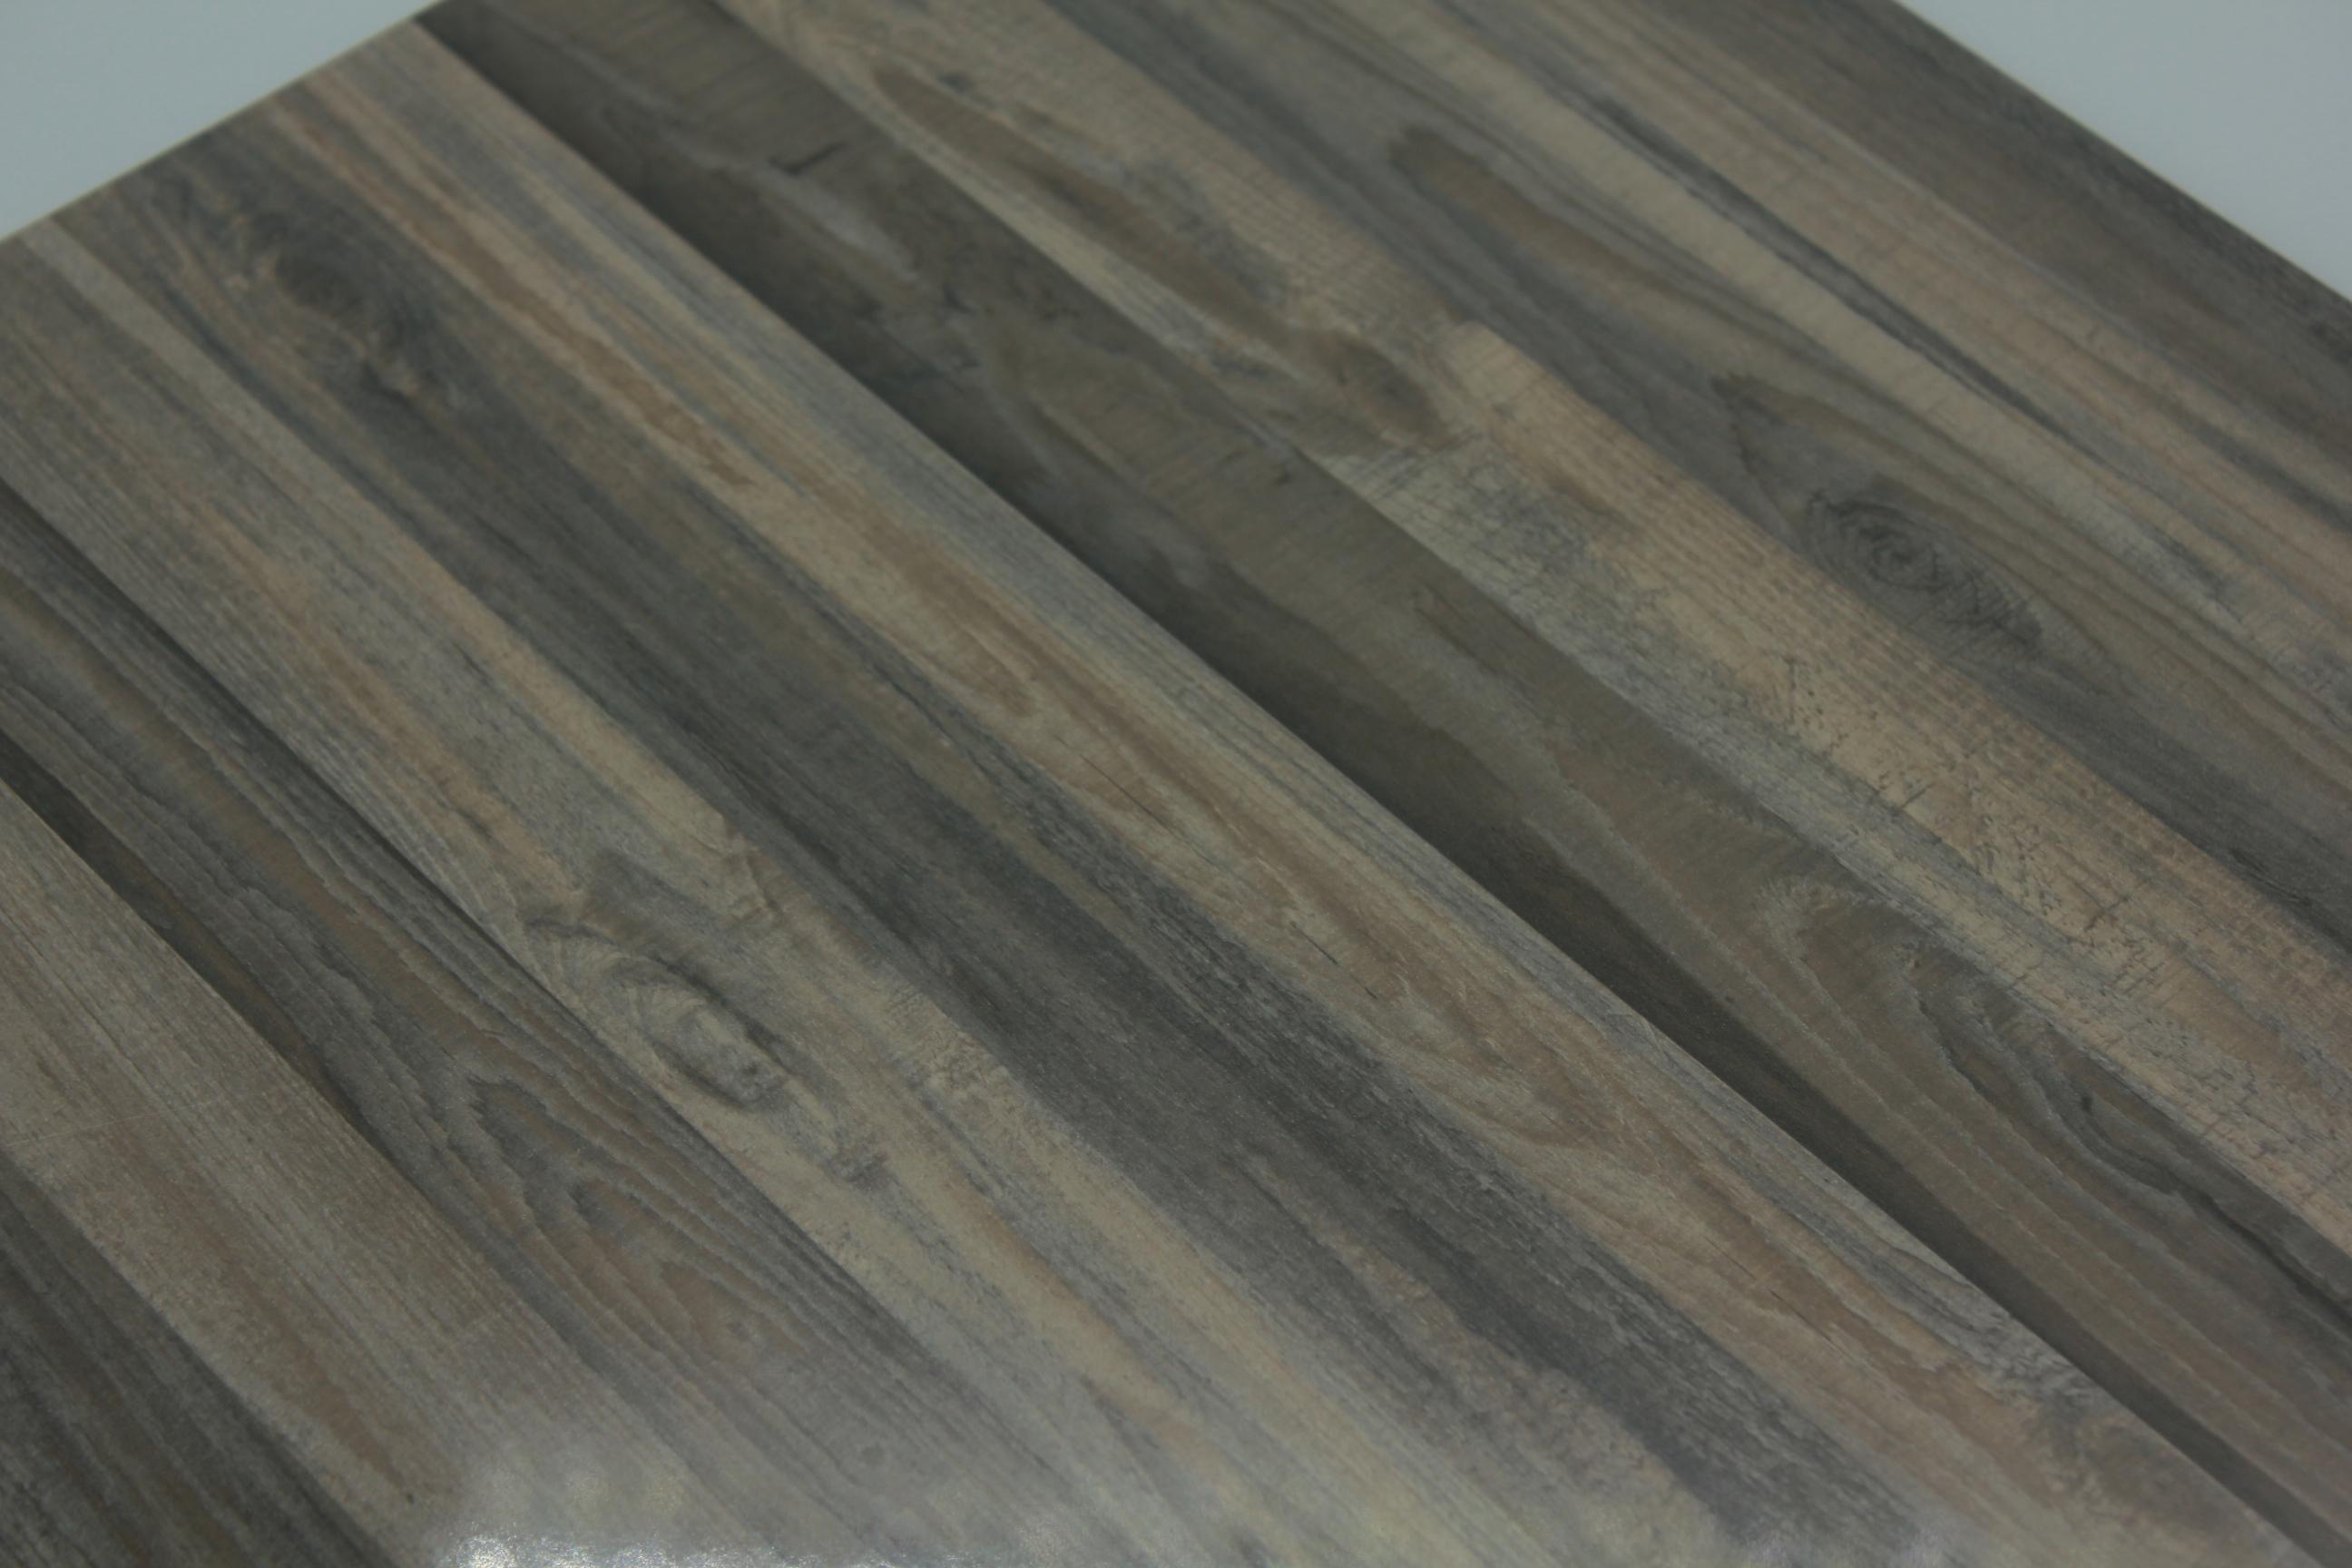 Carbon fiber ceramic for bathroom and kitchen application